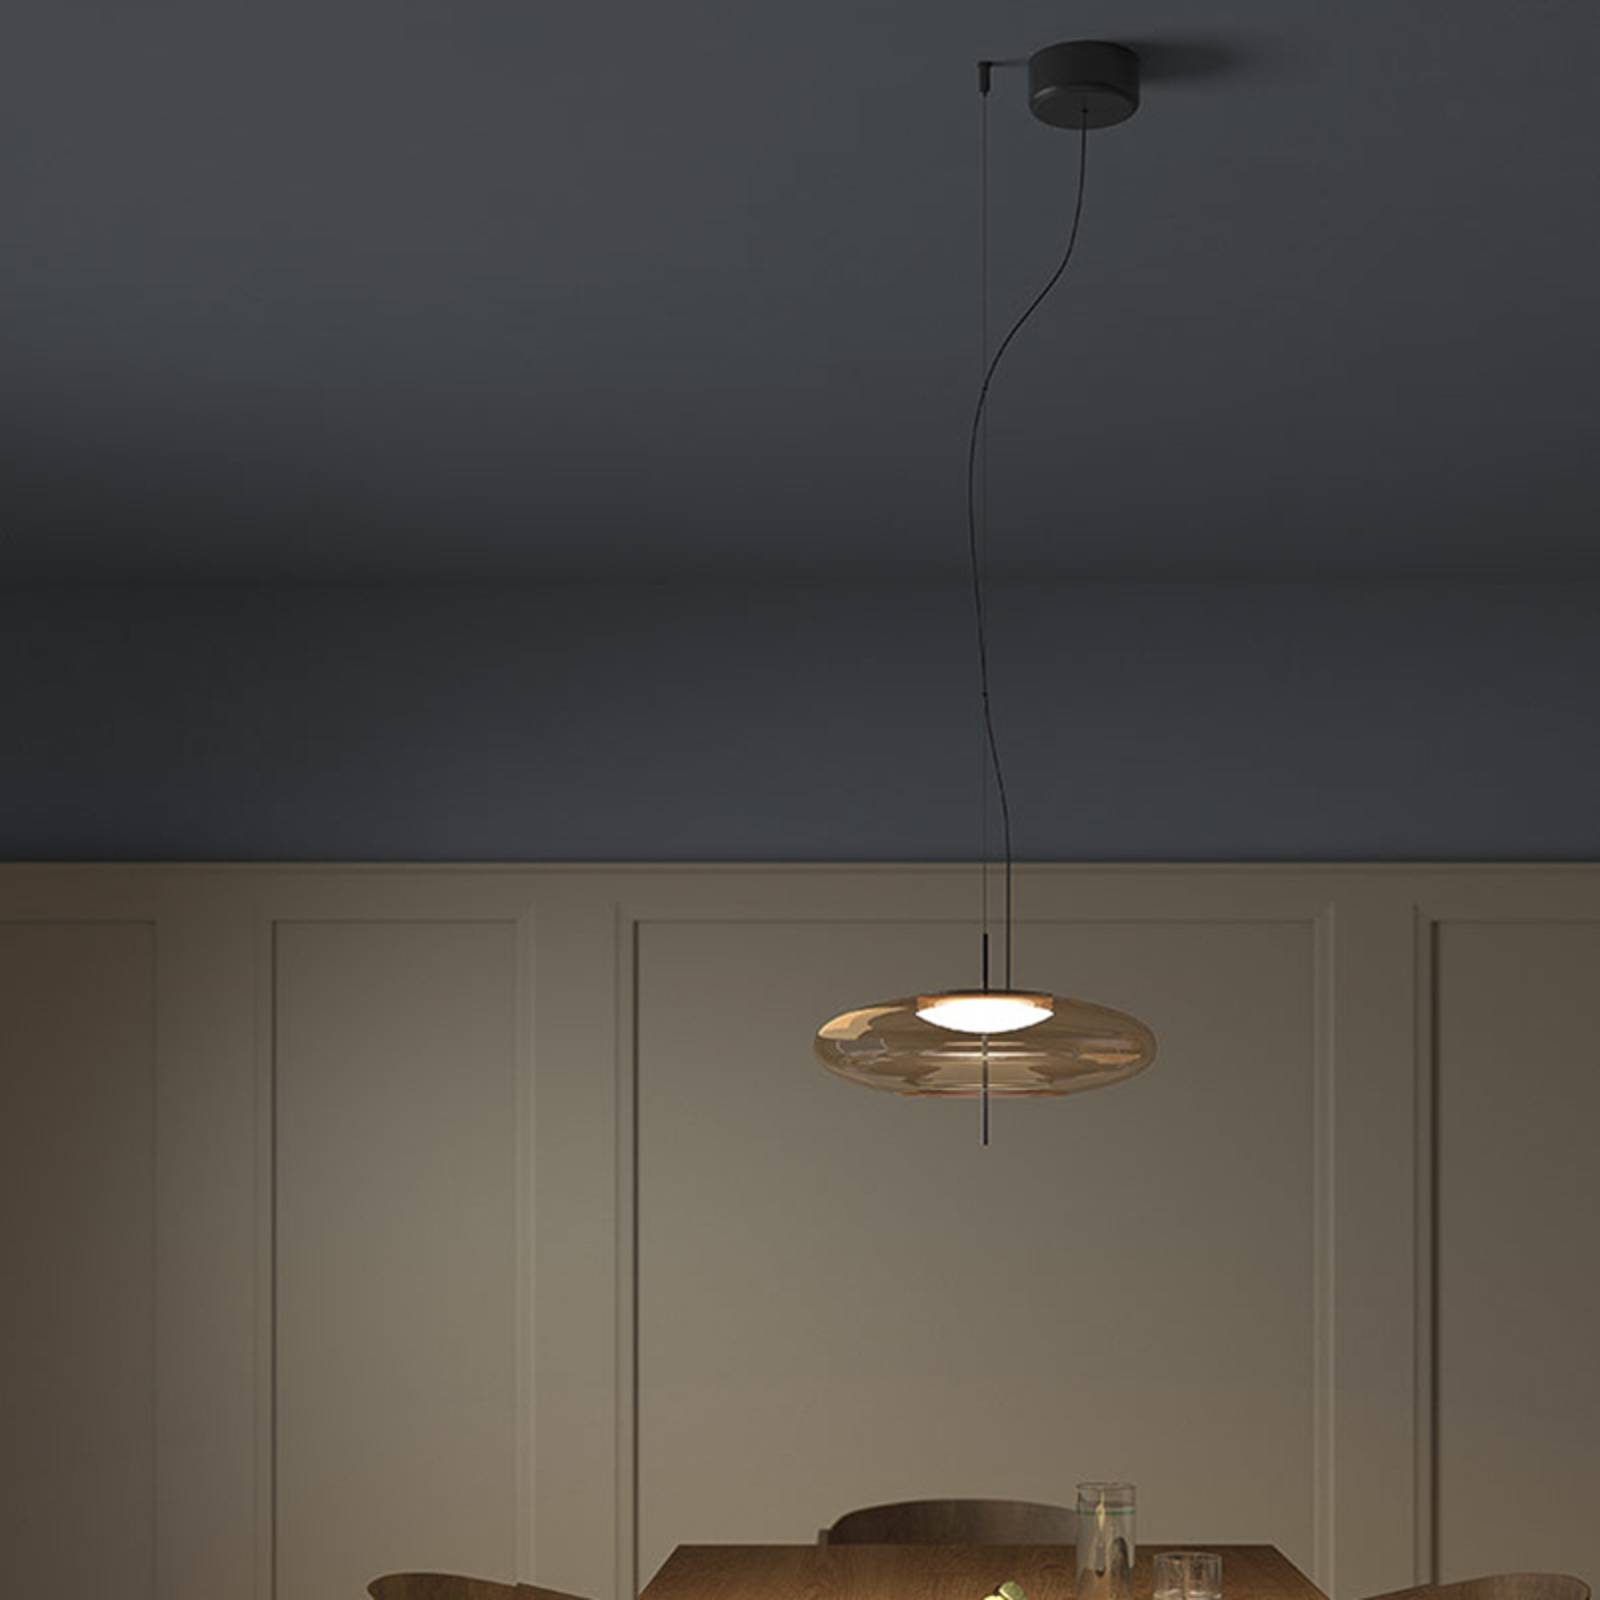 LEDS-C4 Plat-LED-riippuvalo epäkeskinen, meripihka